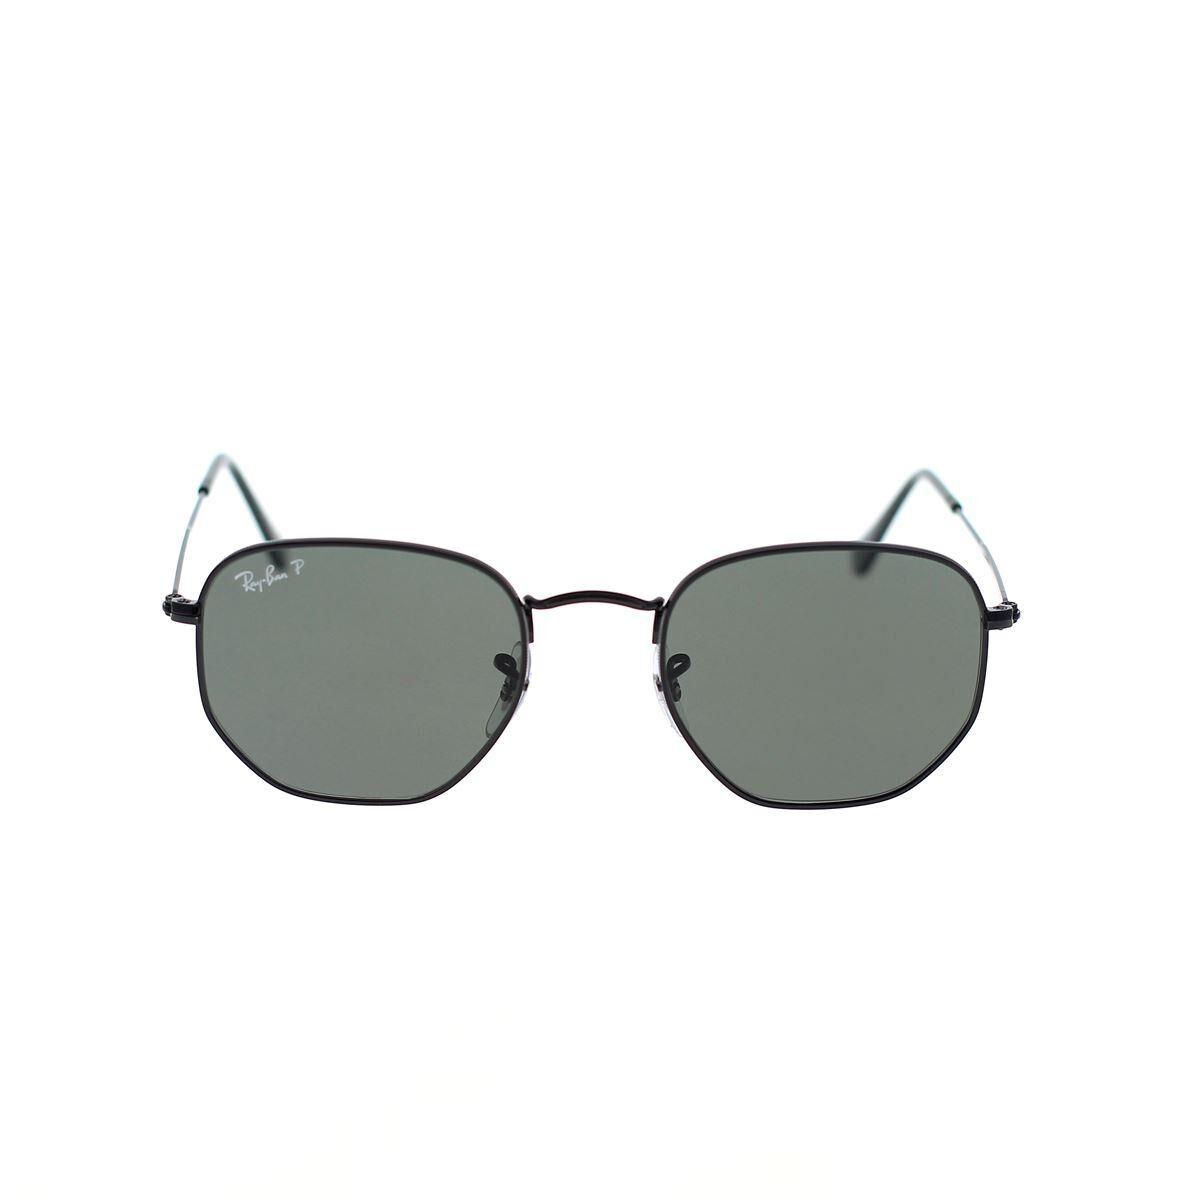 ray-ban occhiali da sole hexagonal rb3548n 002/58 polarizzati